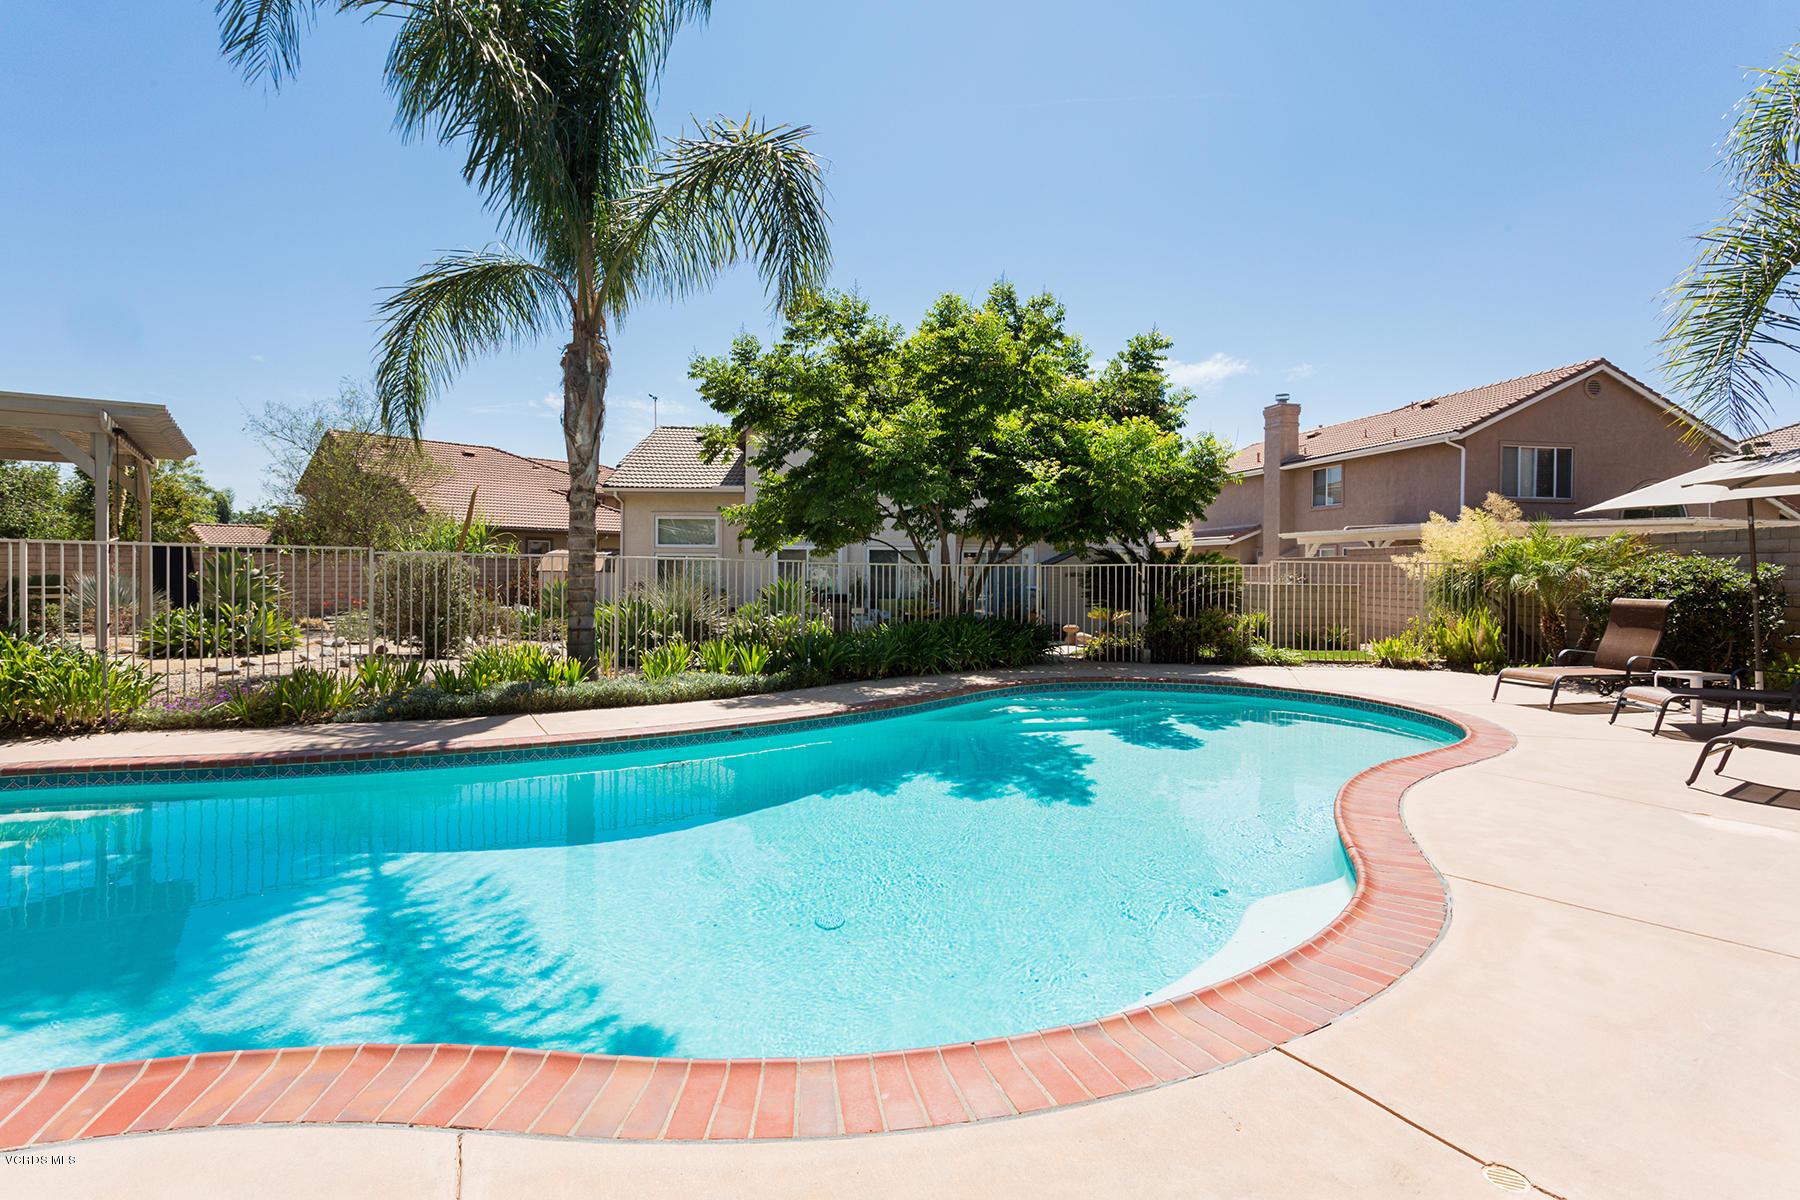 2790 Santa Ynez Avenue, Simi Valley, CA 93063